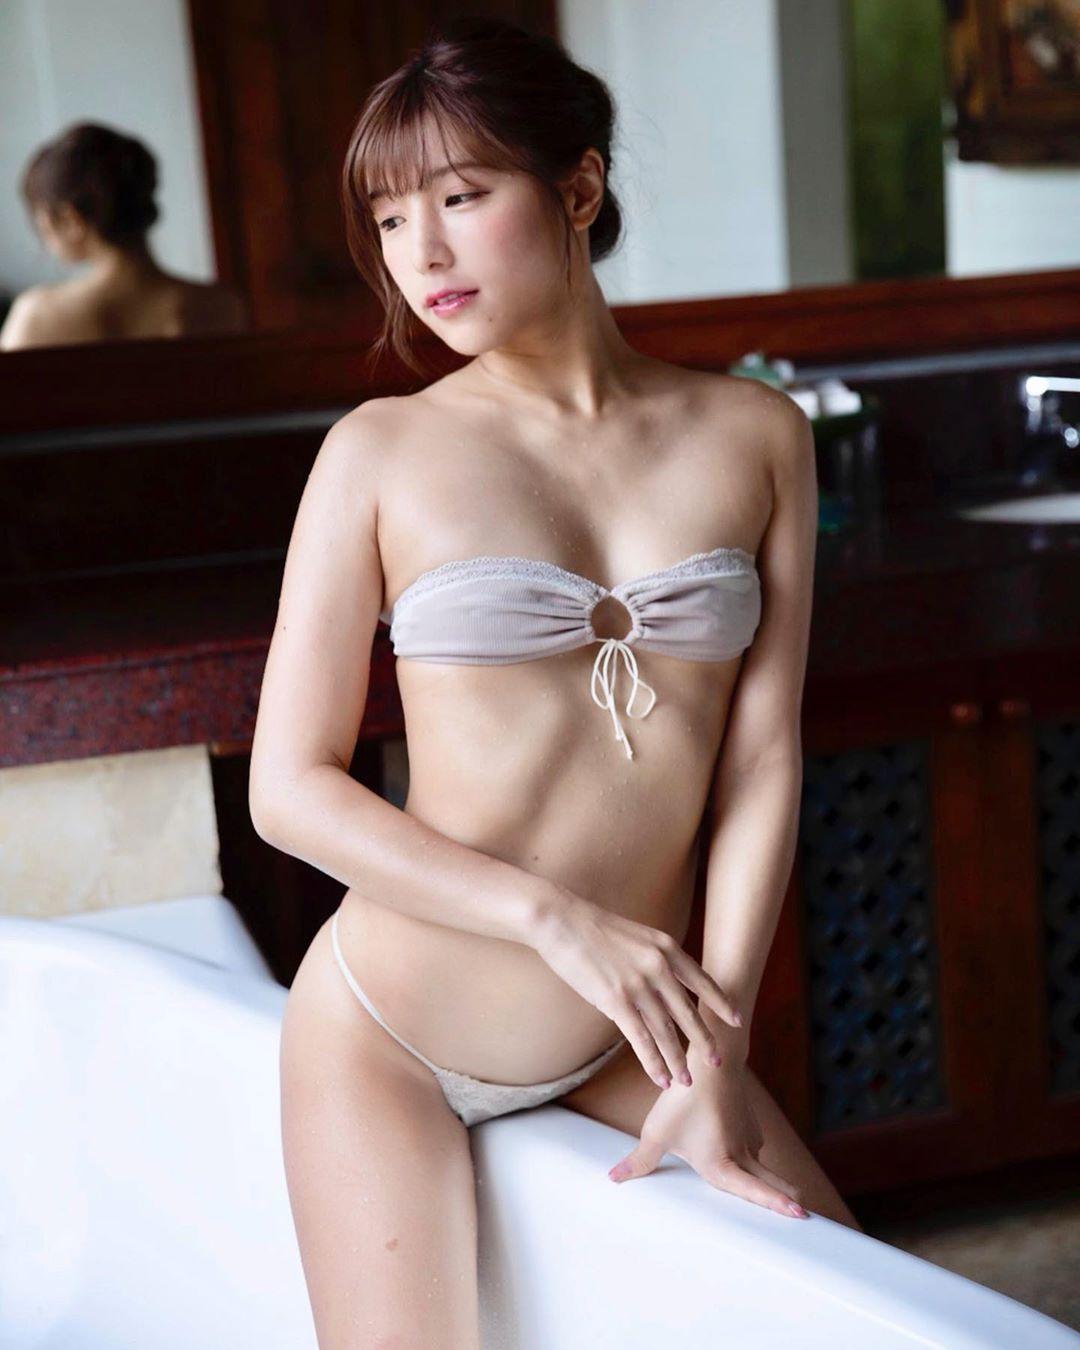 natsumotoasami 75252638 956814681346396 9056071654451487499 n - 正妹寫真—性感系列270